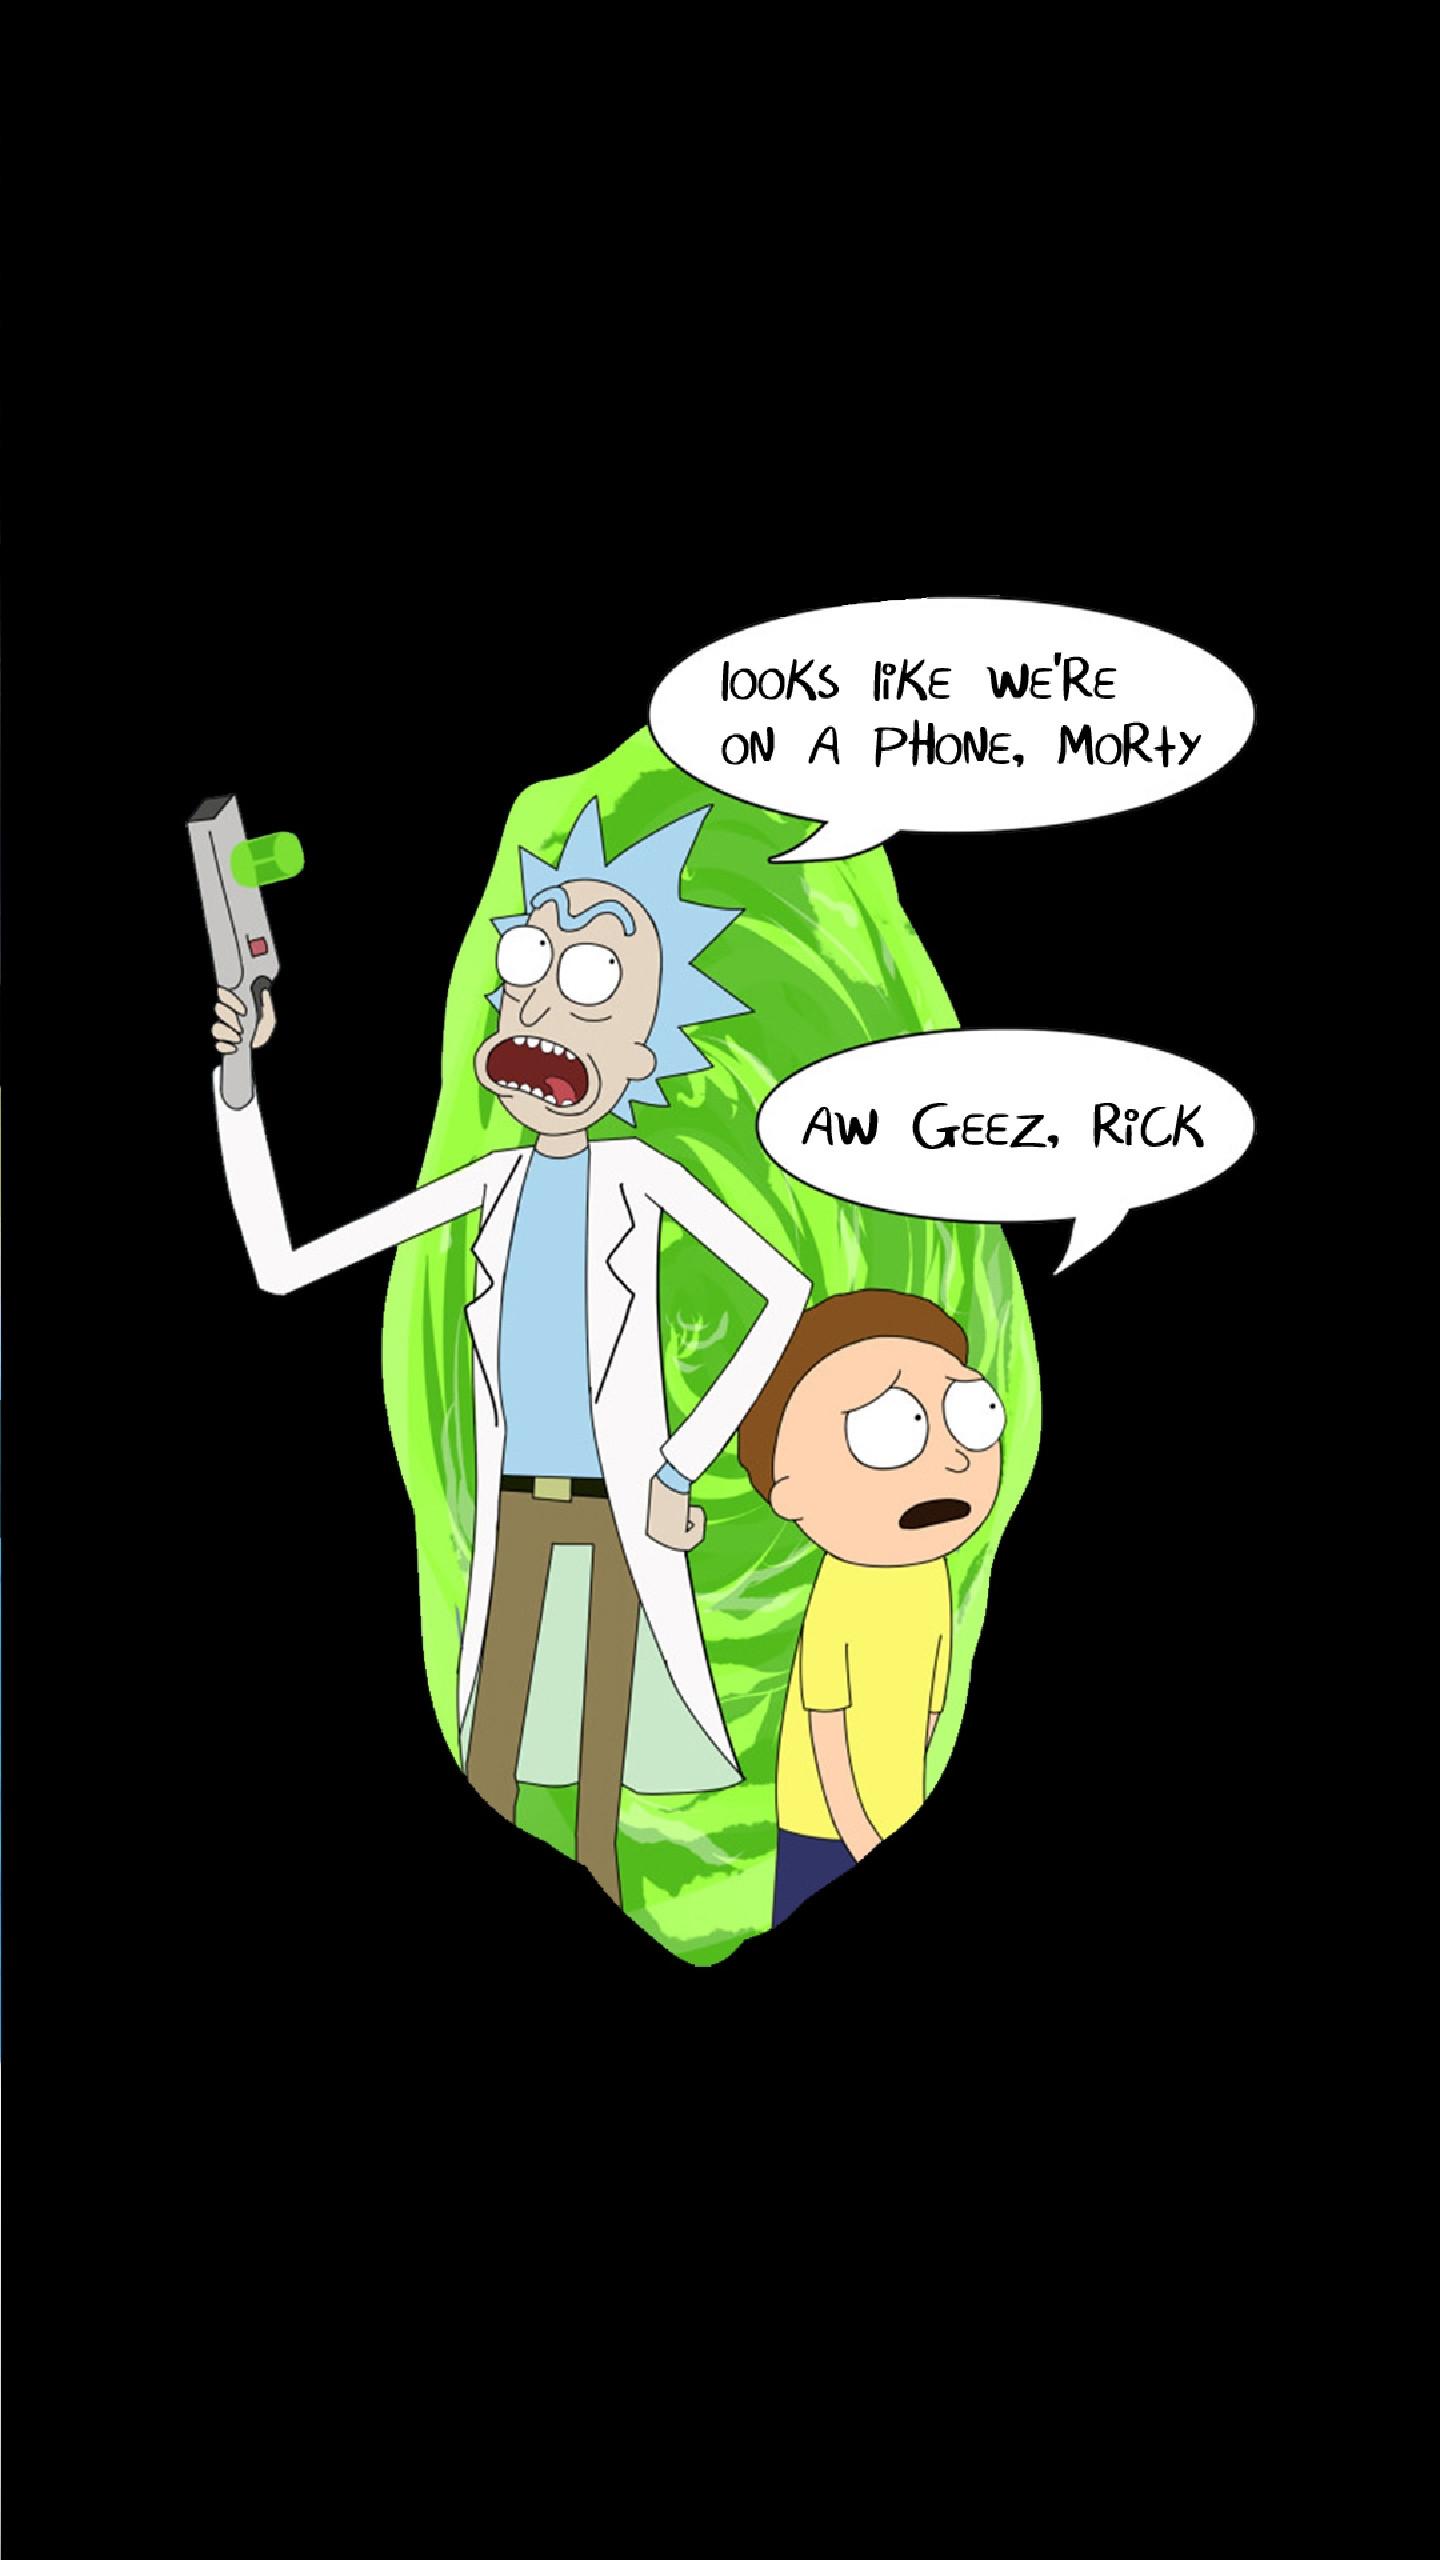 Rick and Morty AMOLED Wallpaper HQ …